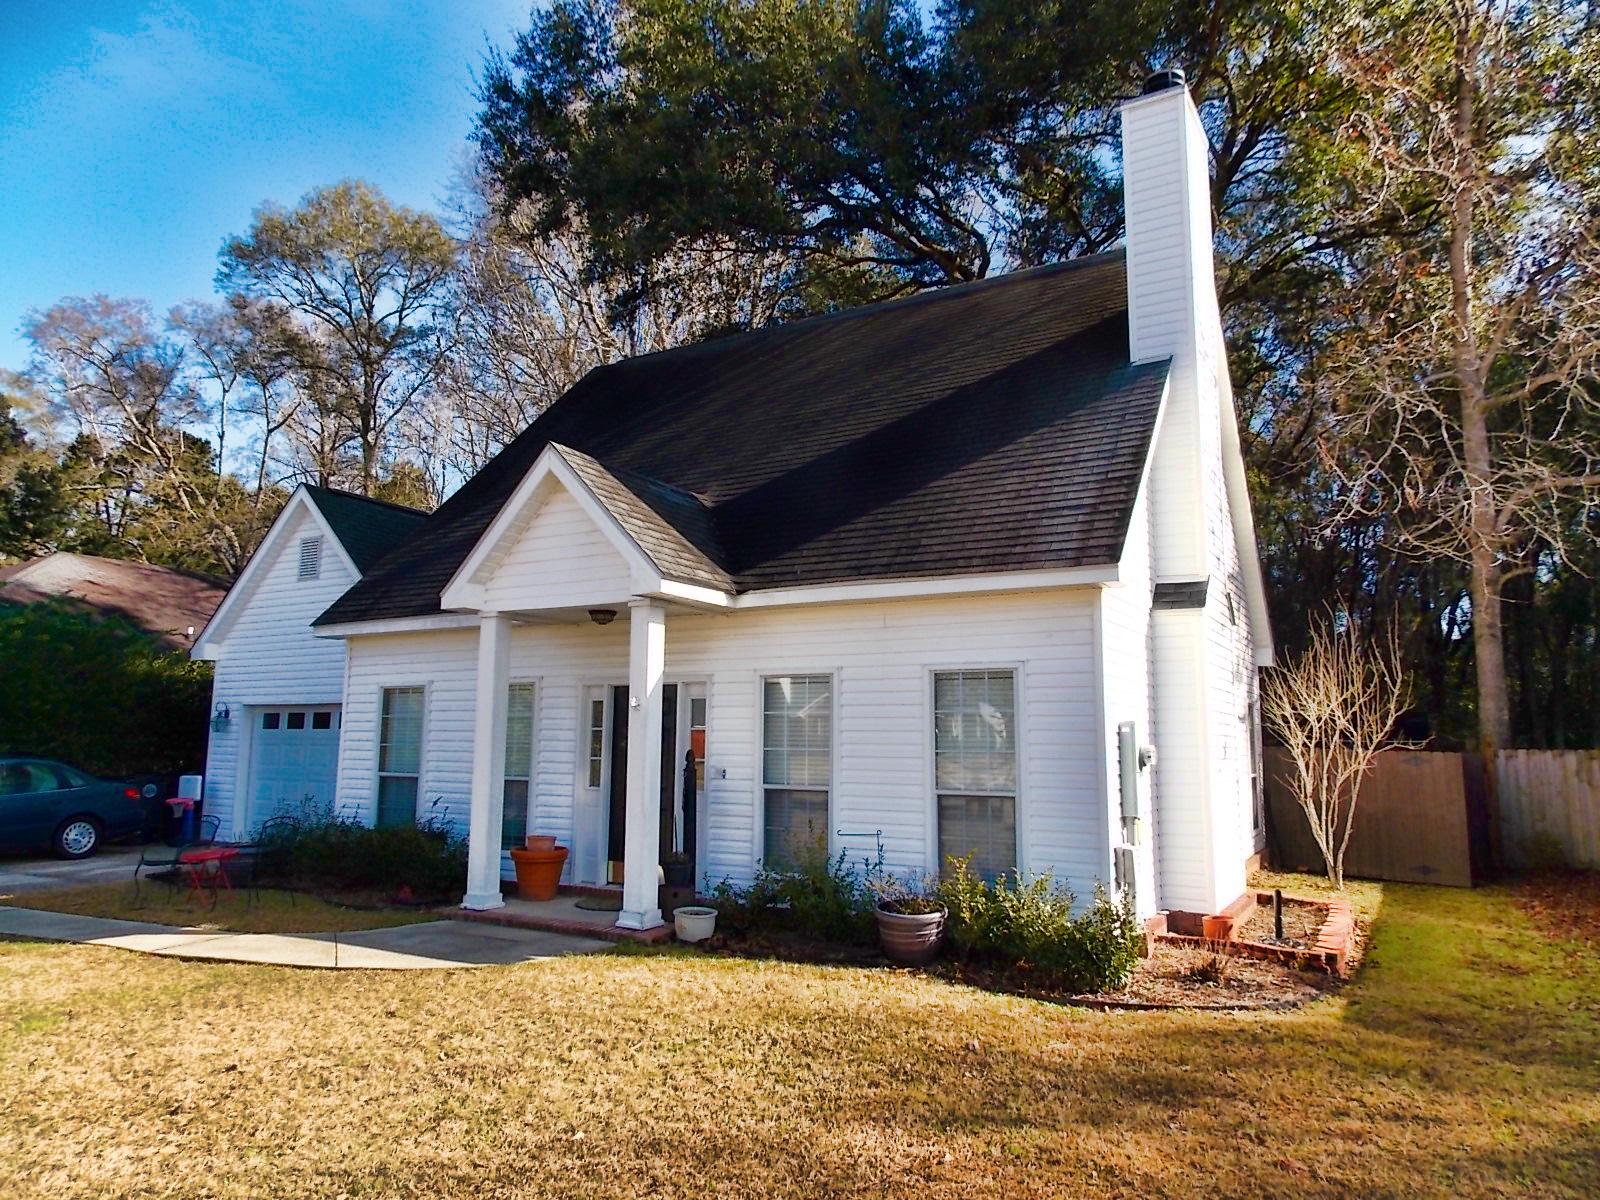 River mill subdivision homes for sale fairhope al for Home builders in al